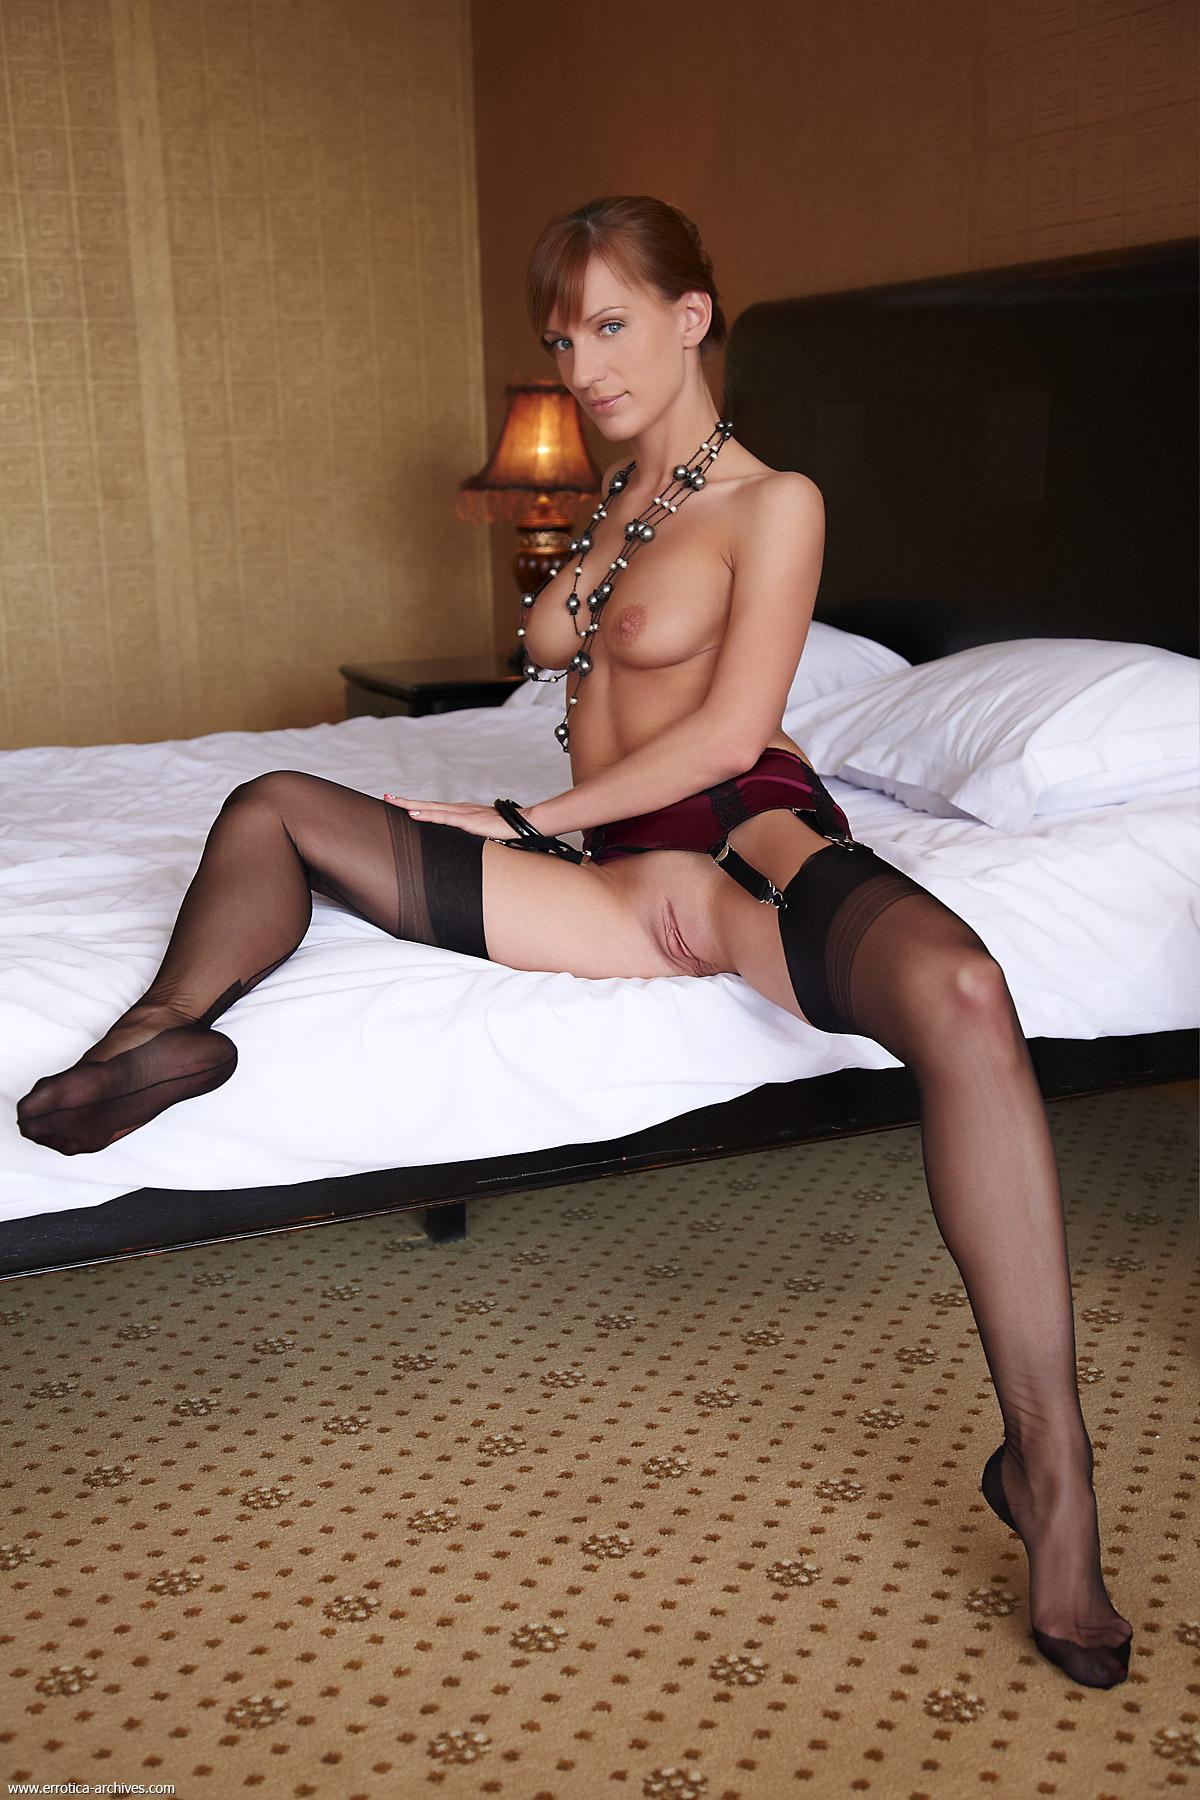 giselle  escort model escort Perth